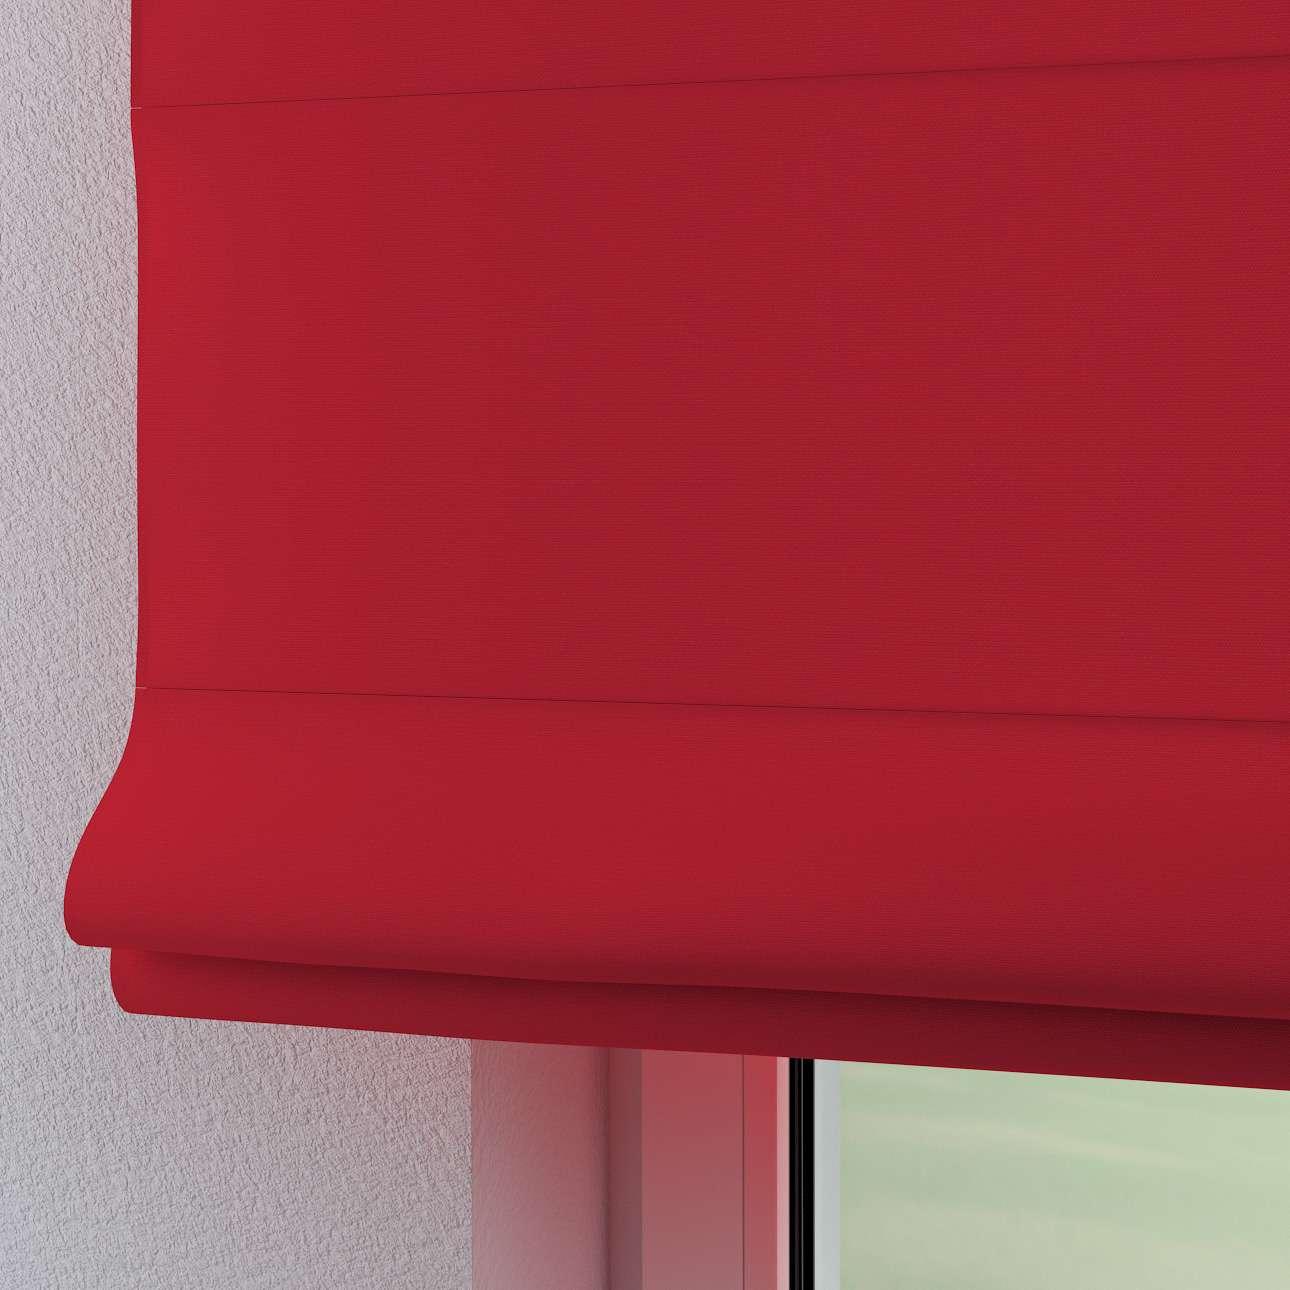 Verona tab top roman blind 80 x 170 cm (31.5 x 67 inch) in collection Cotton Panama, fabric: 702-04